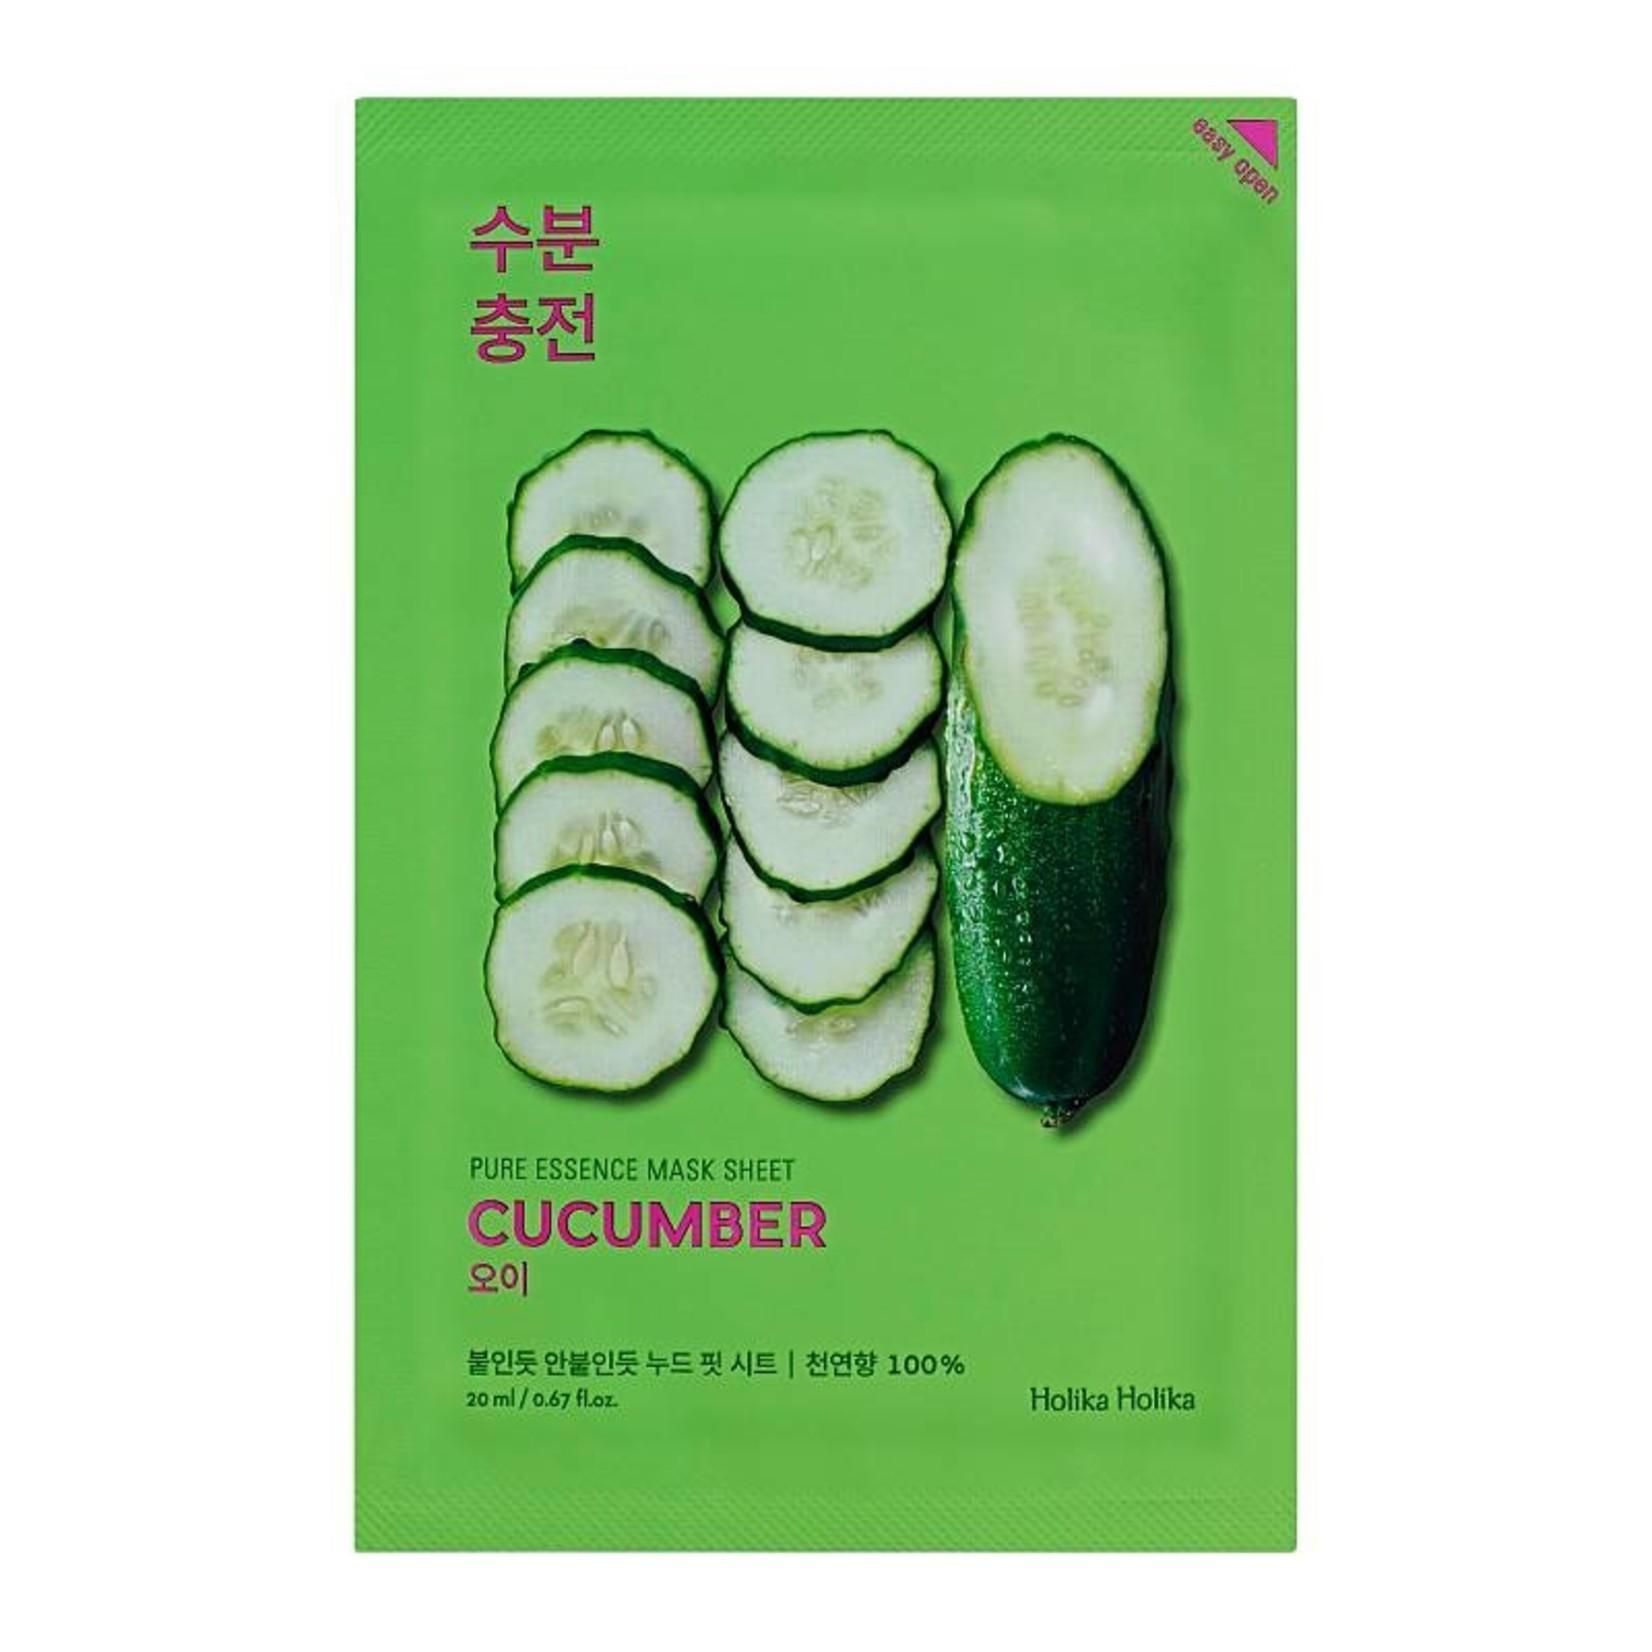 Holika Holika Pure Essence Mask Sheet Cucumber 10 pcs